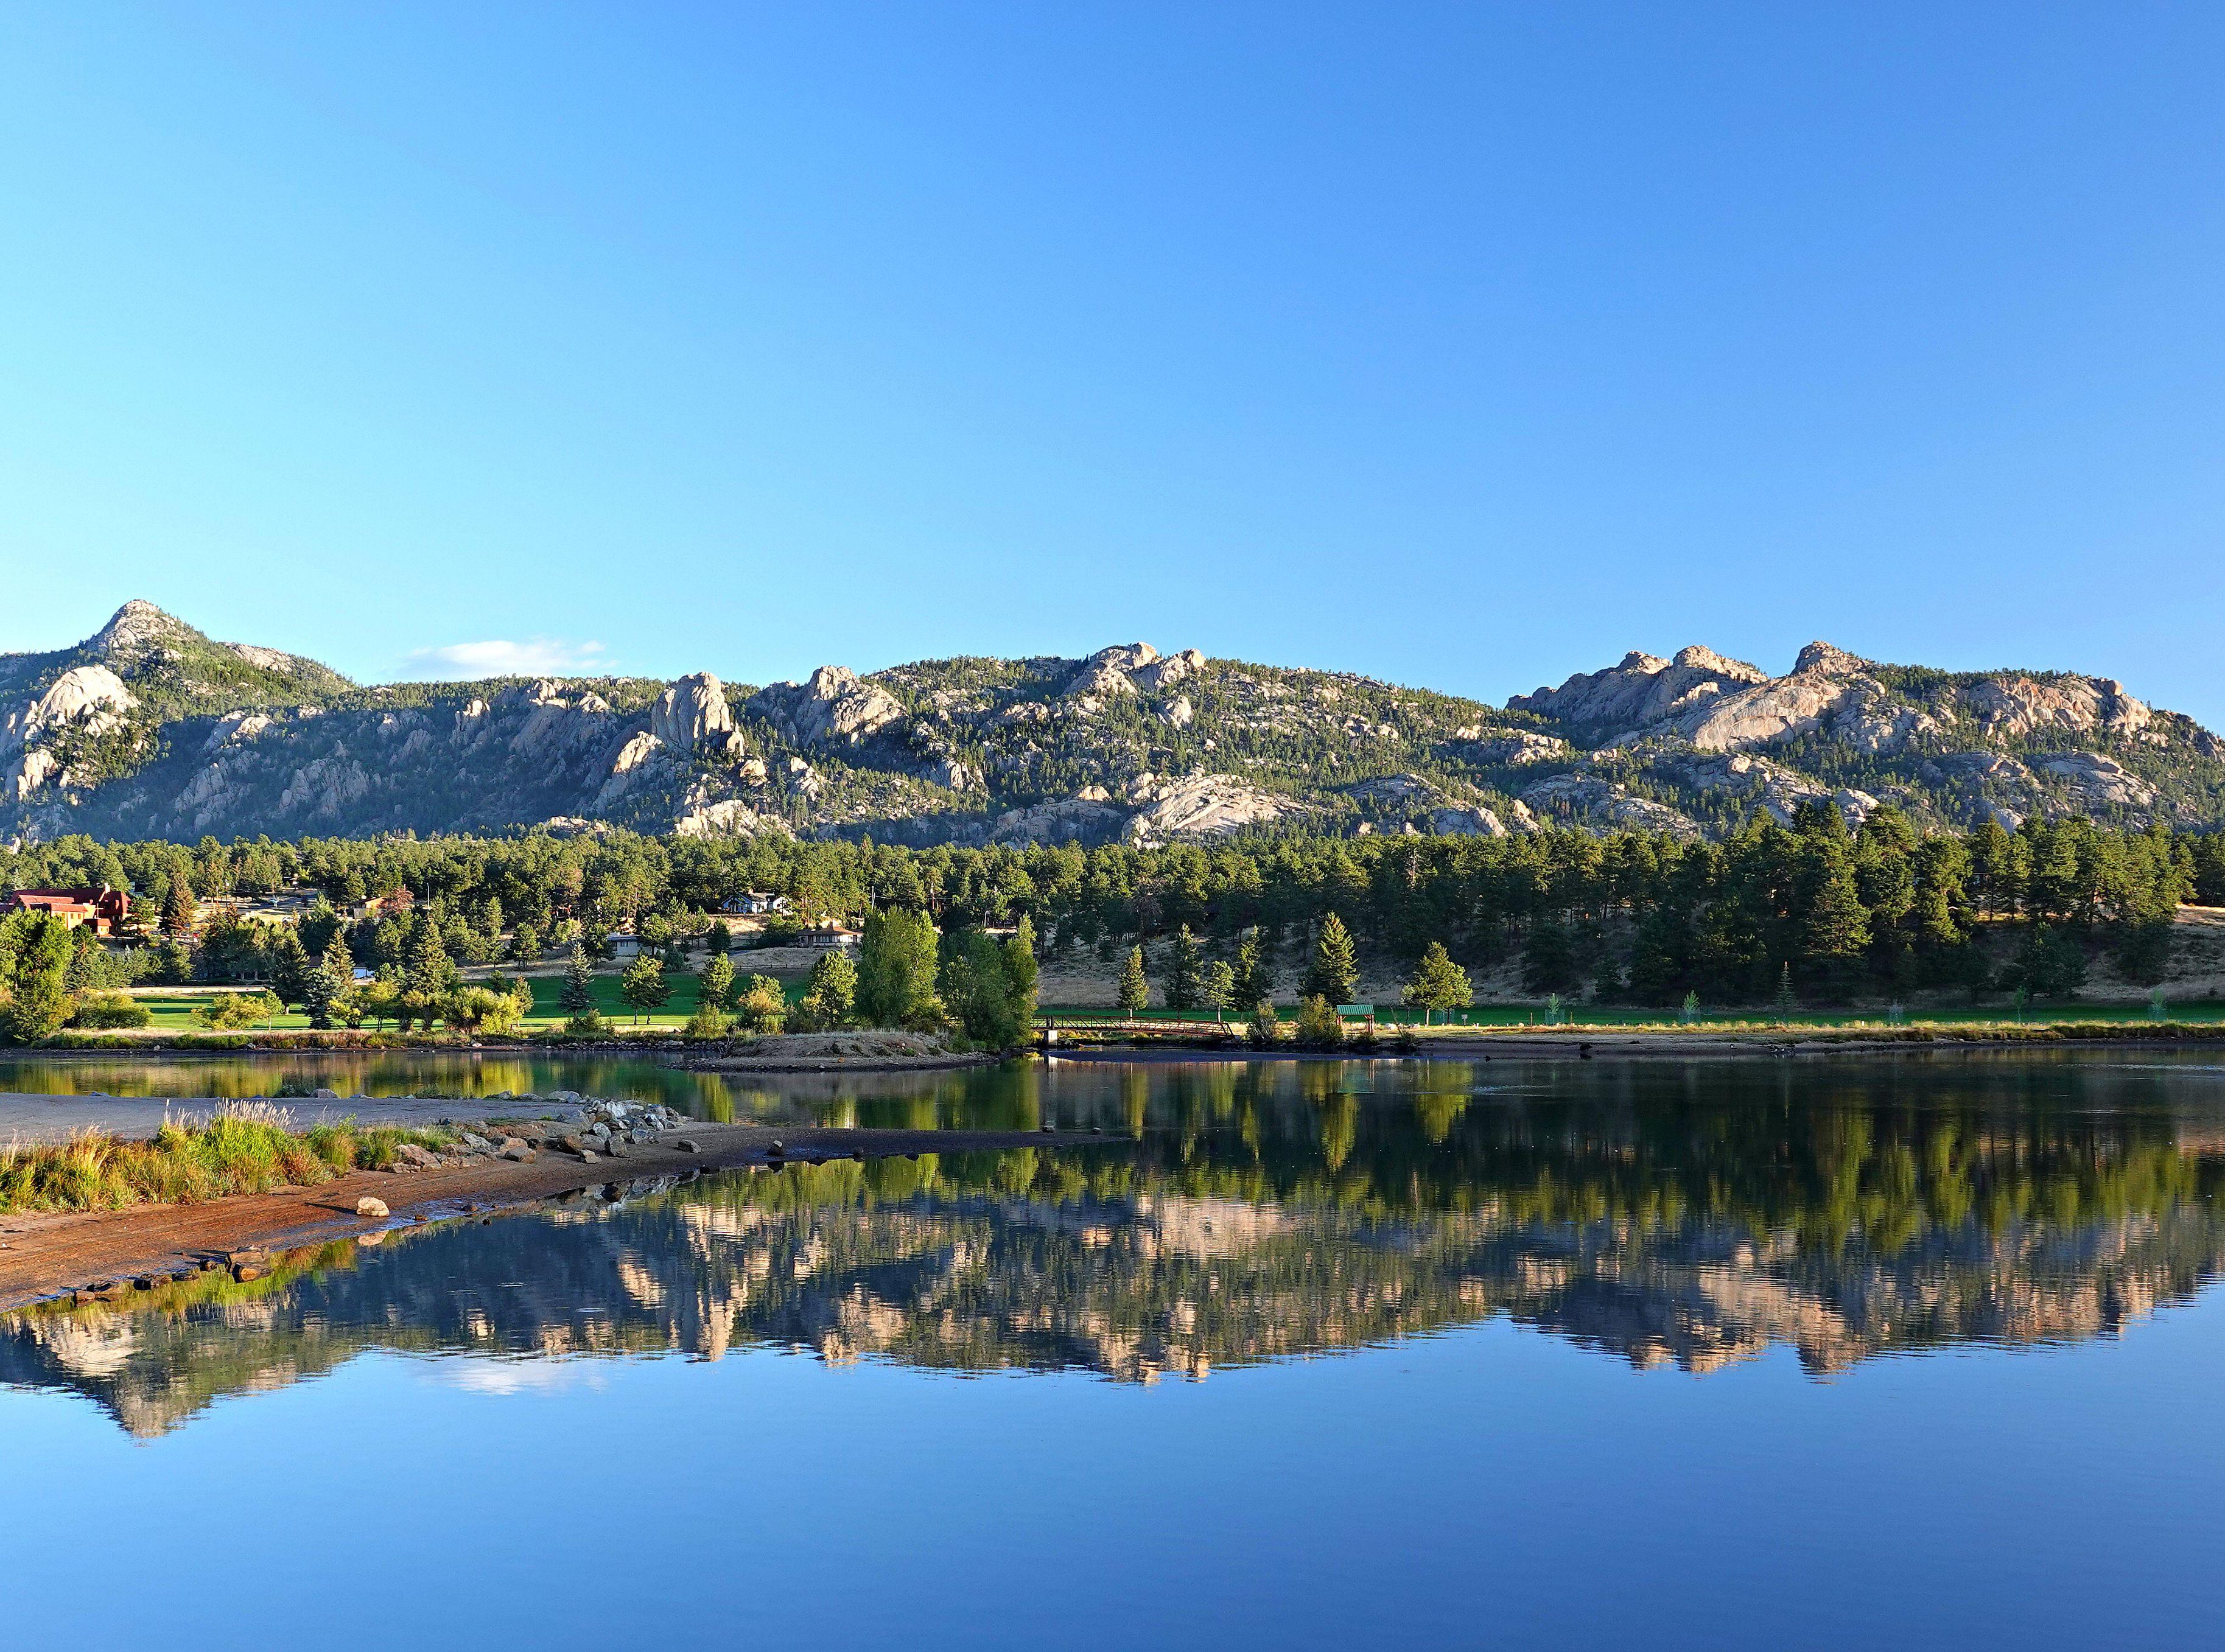 The 7 Best Cabin Rentals in Estes Park of 2020